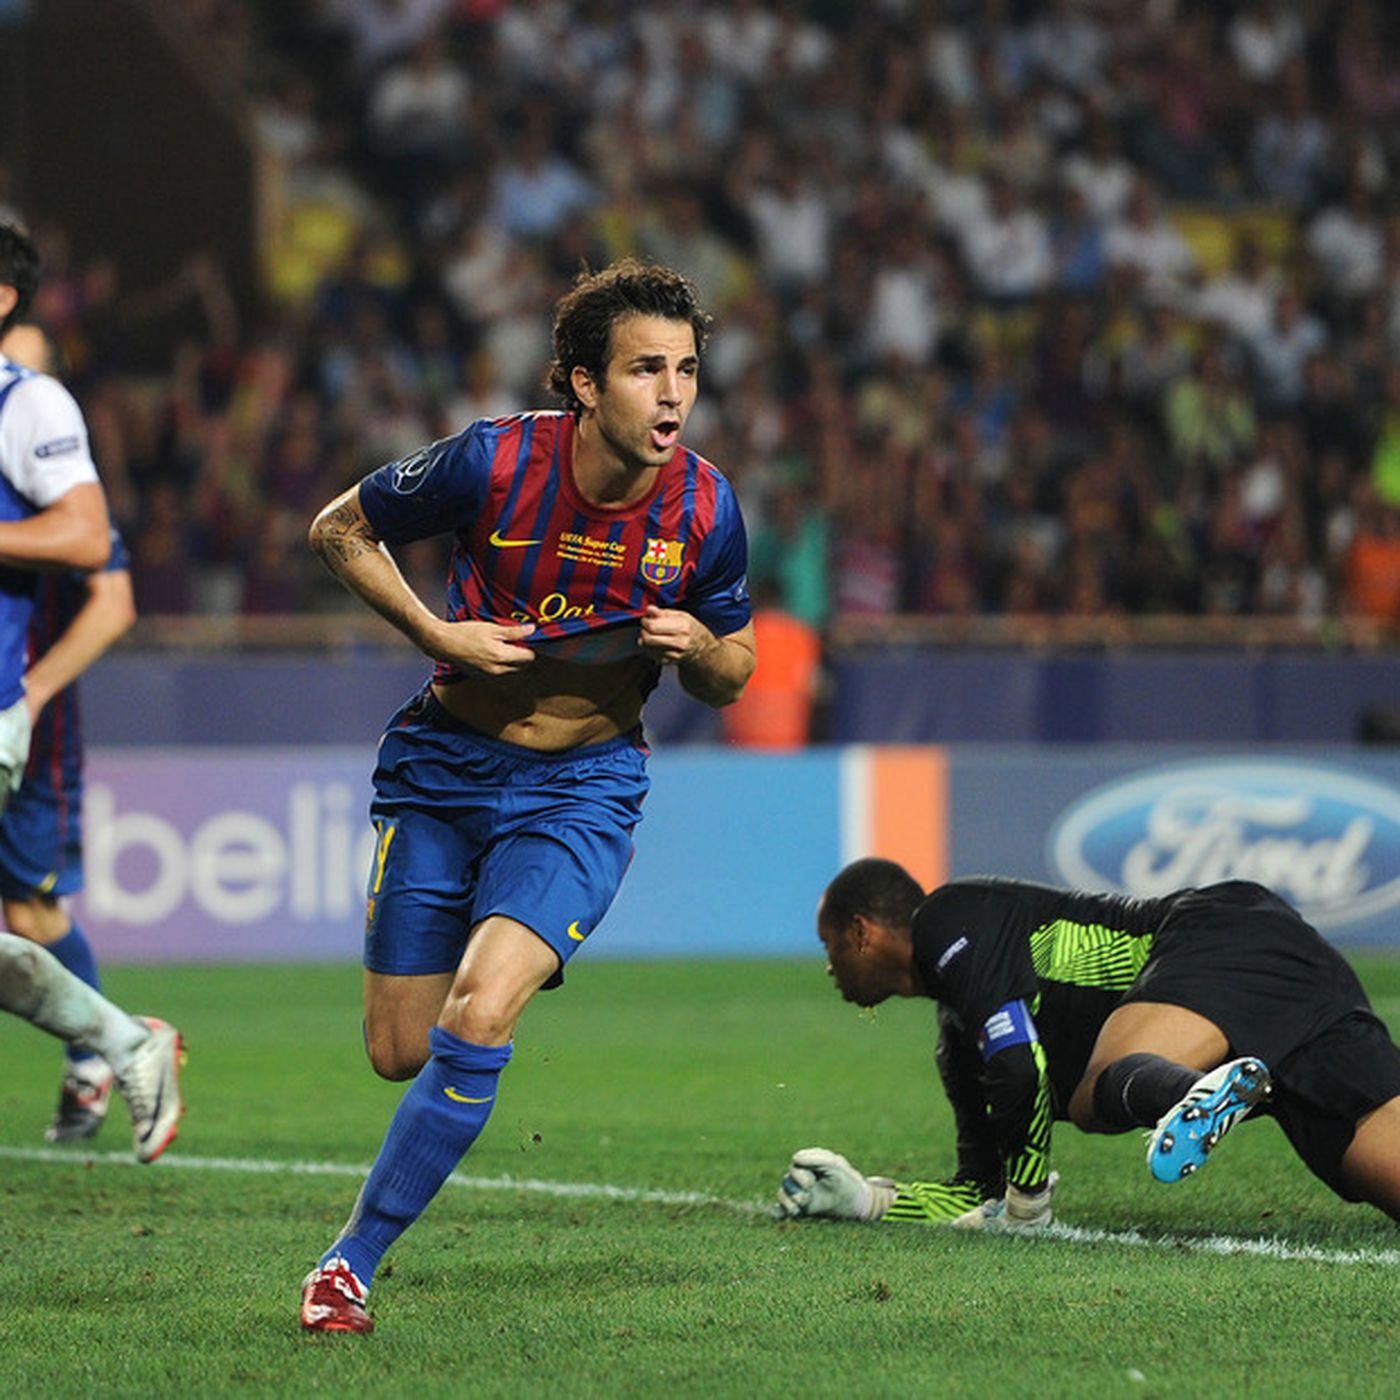 Fc Barcelona 2011 12 Season In Review Cesc Fabregas Barca Blaugranes